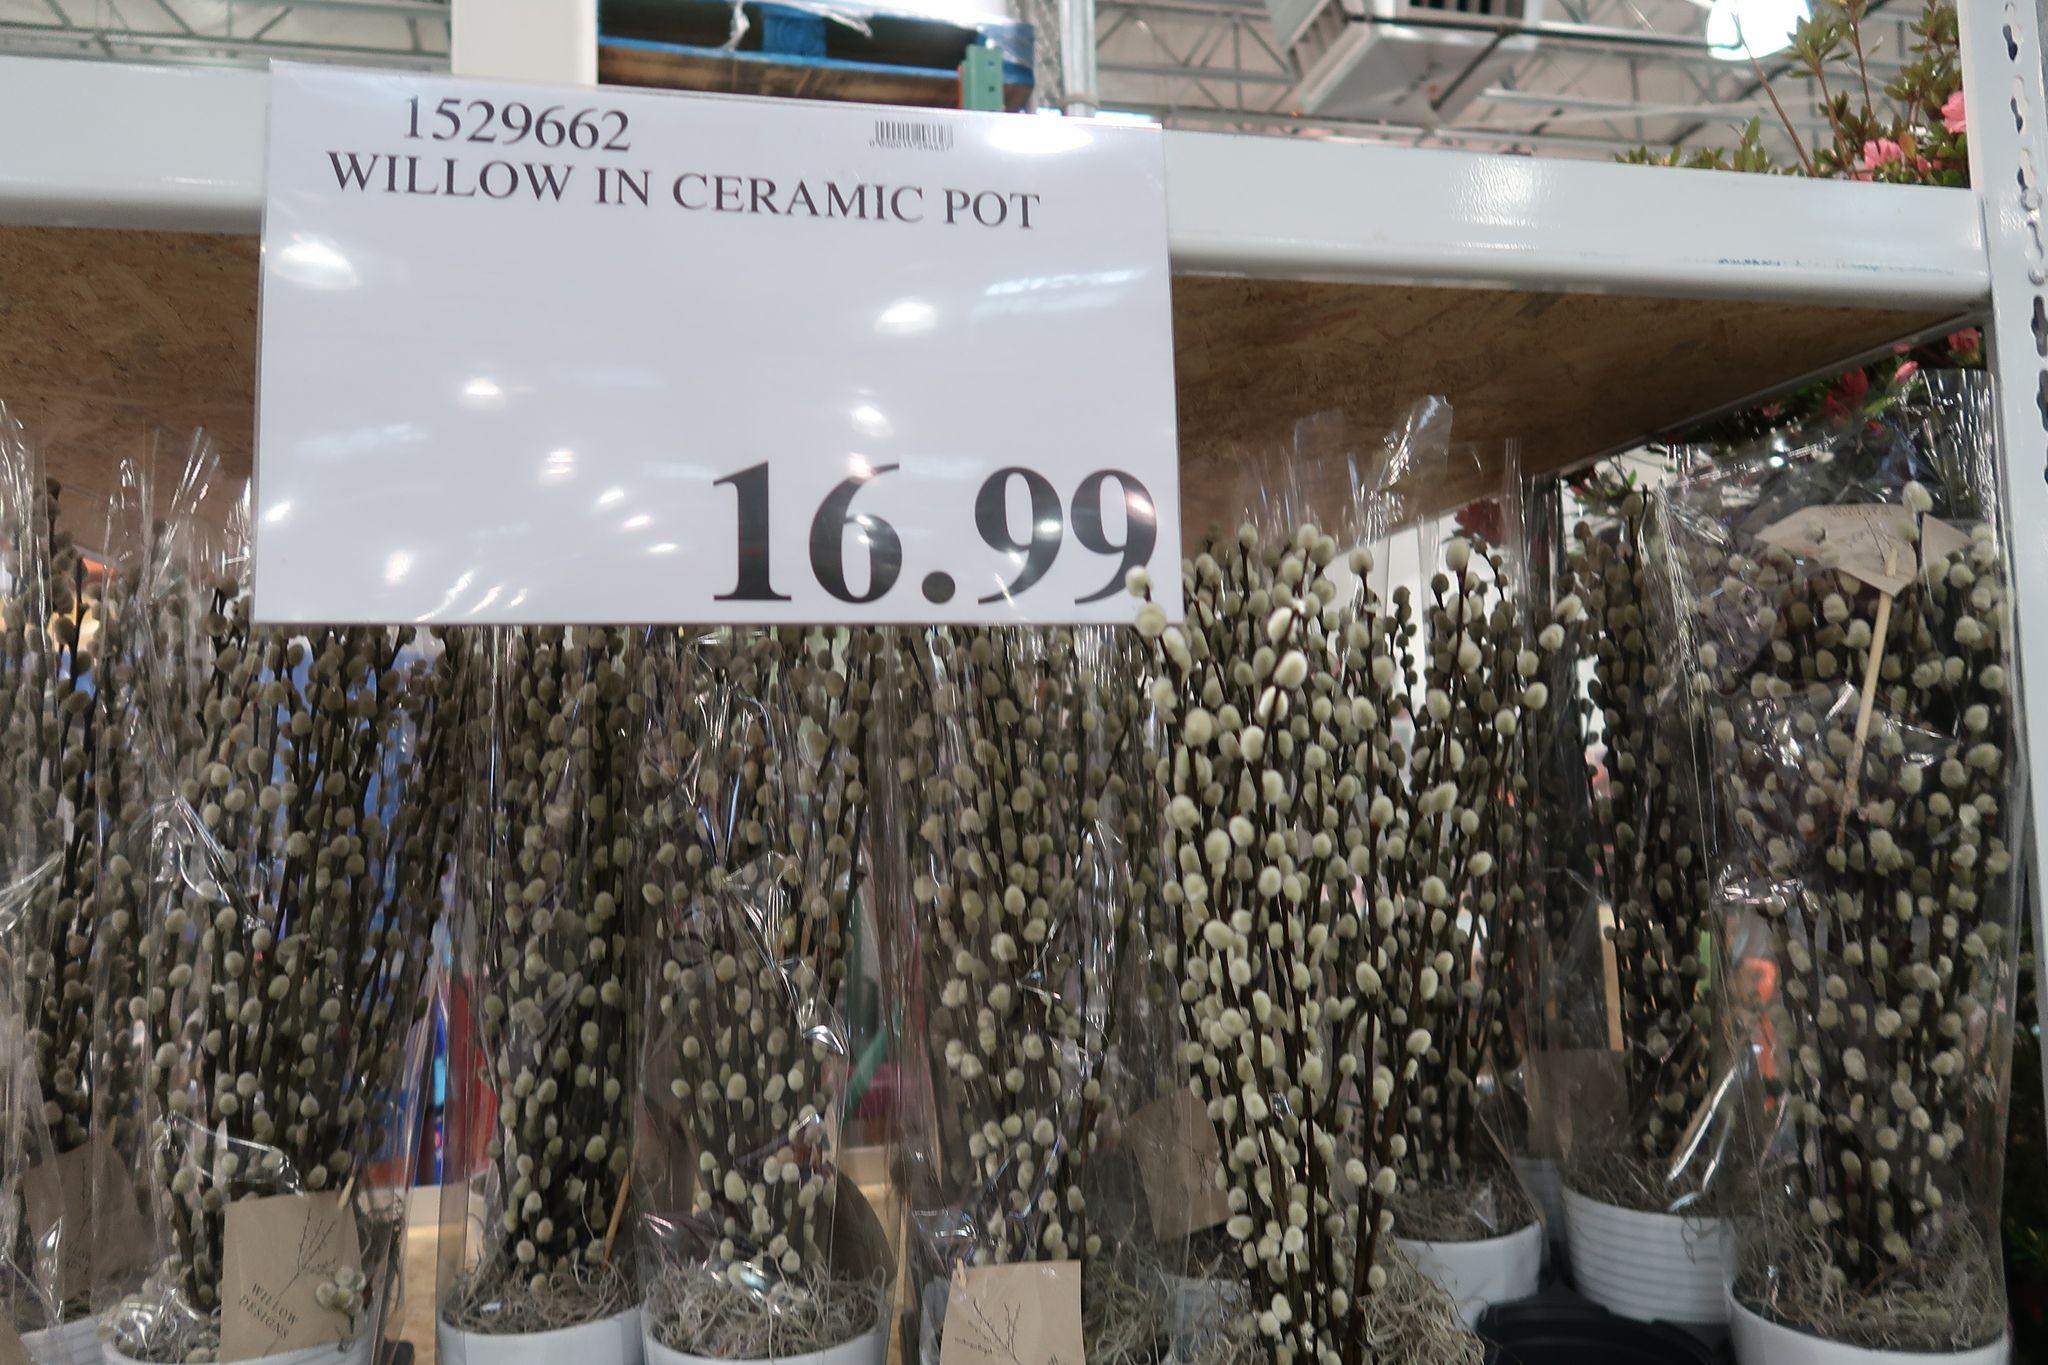 Willow Plants In Ceramic Pots $16.99